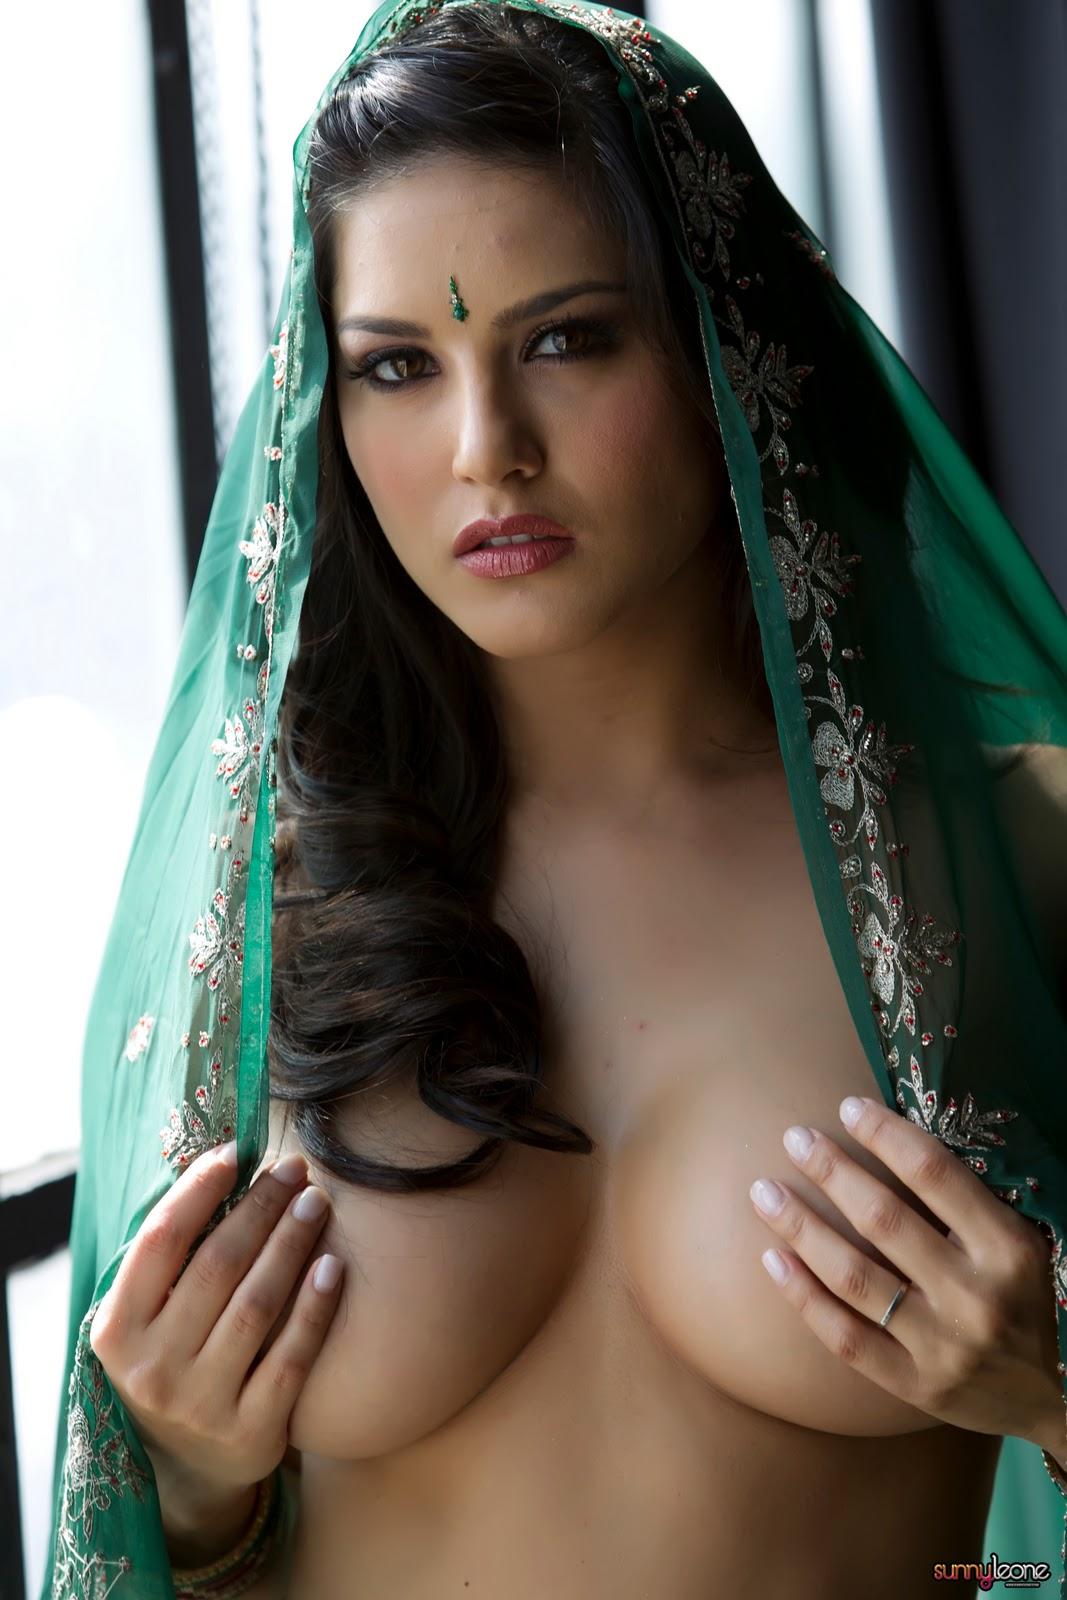 Секс фото индийских красавиц 5 фотография